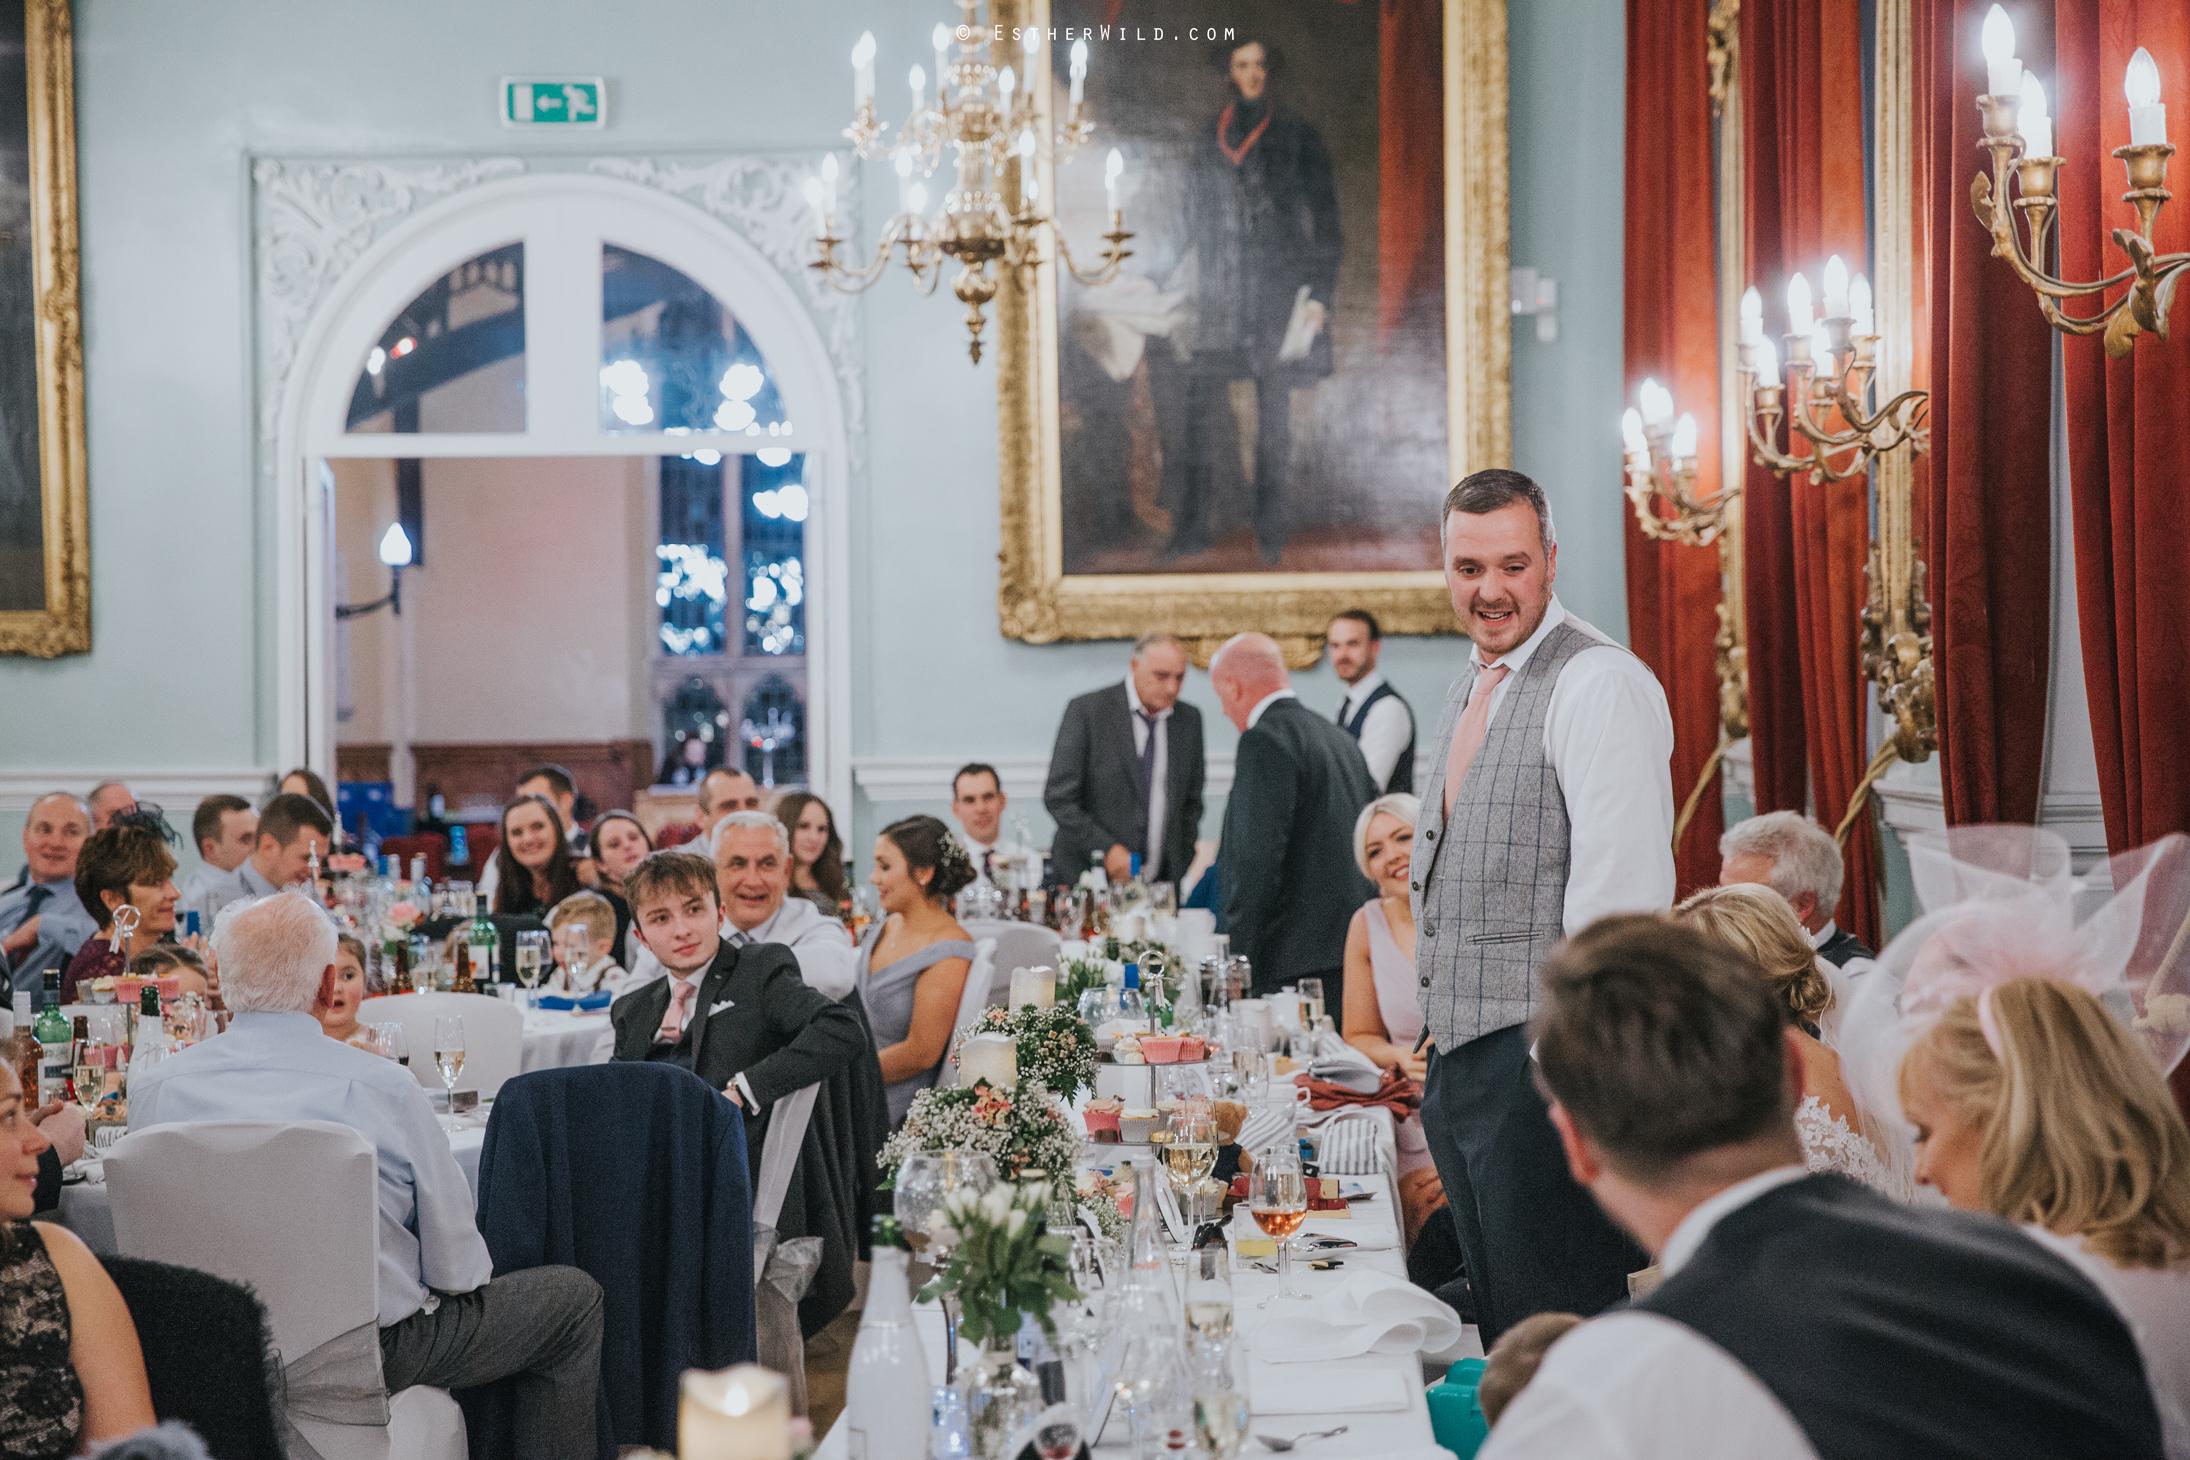 Wedding_Kings_Lynn_Town_Hall_Norfolk_Photographer_Esther_Wild_IMG_1687_IMGL0568.jpg